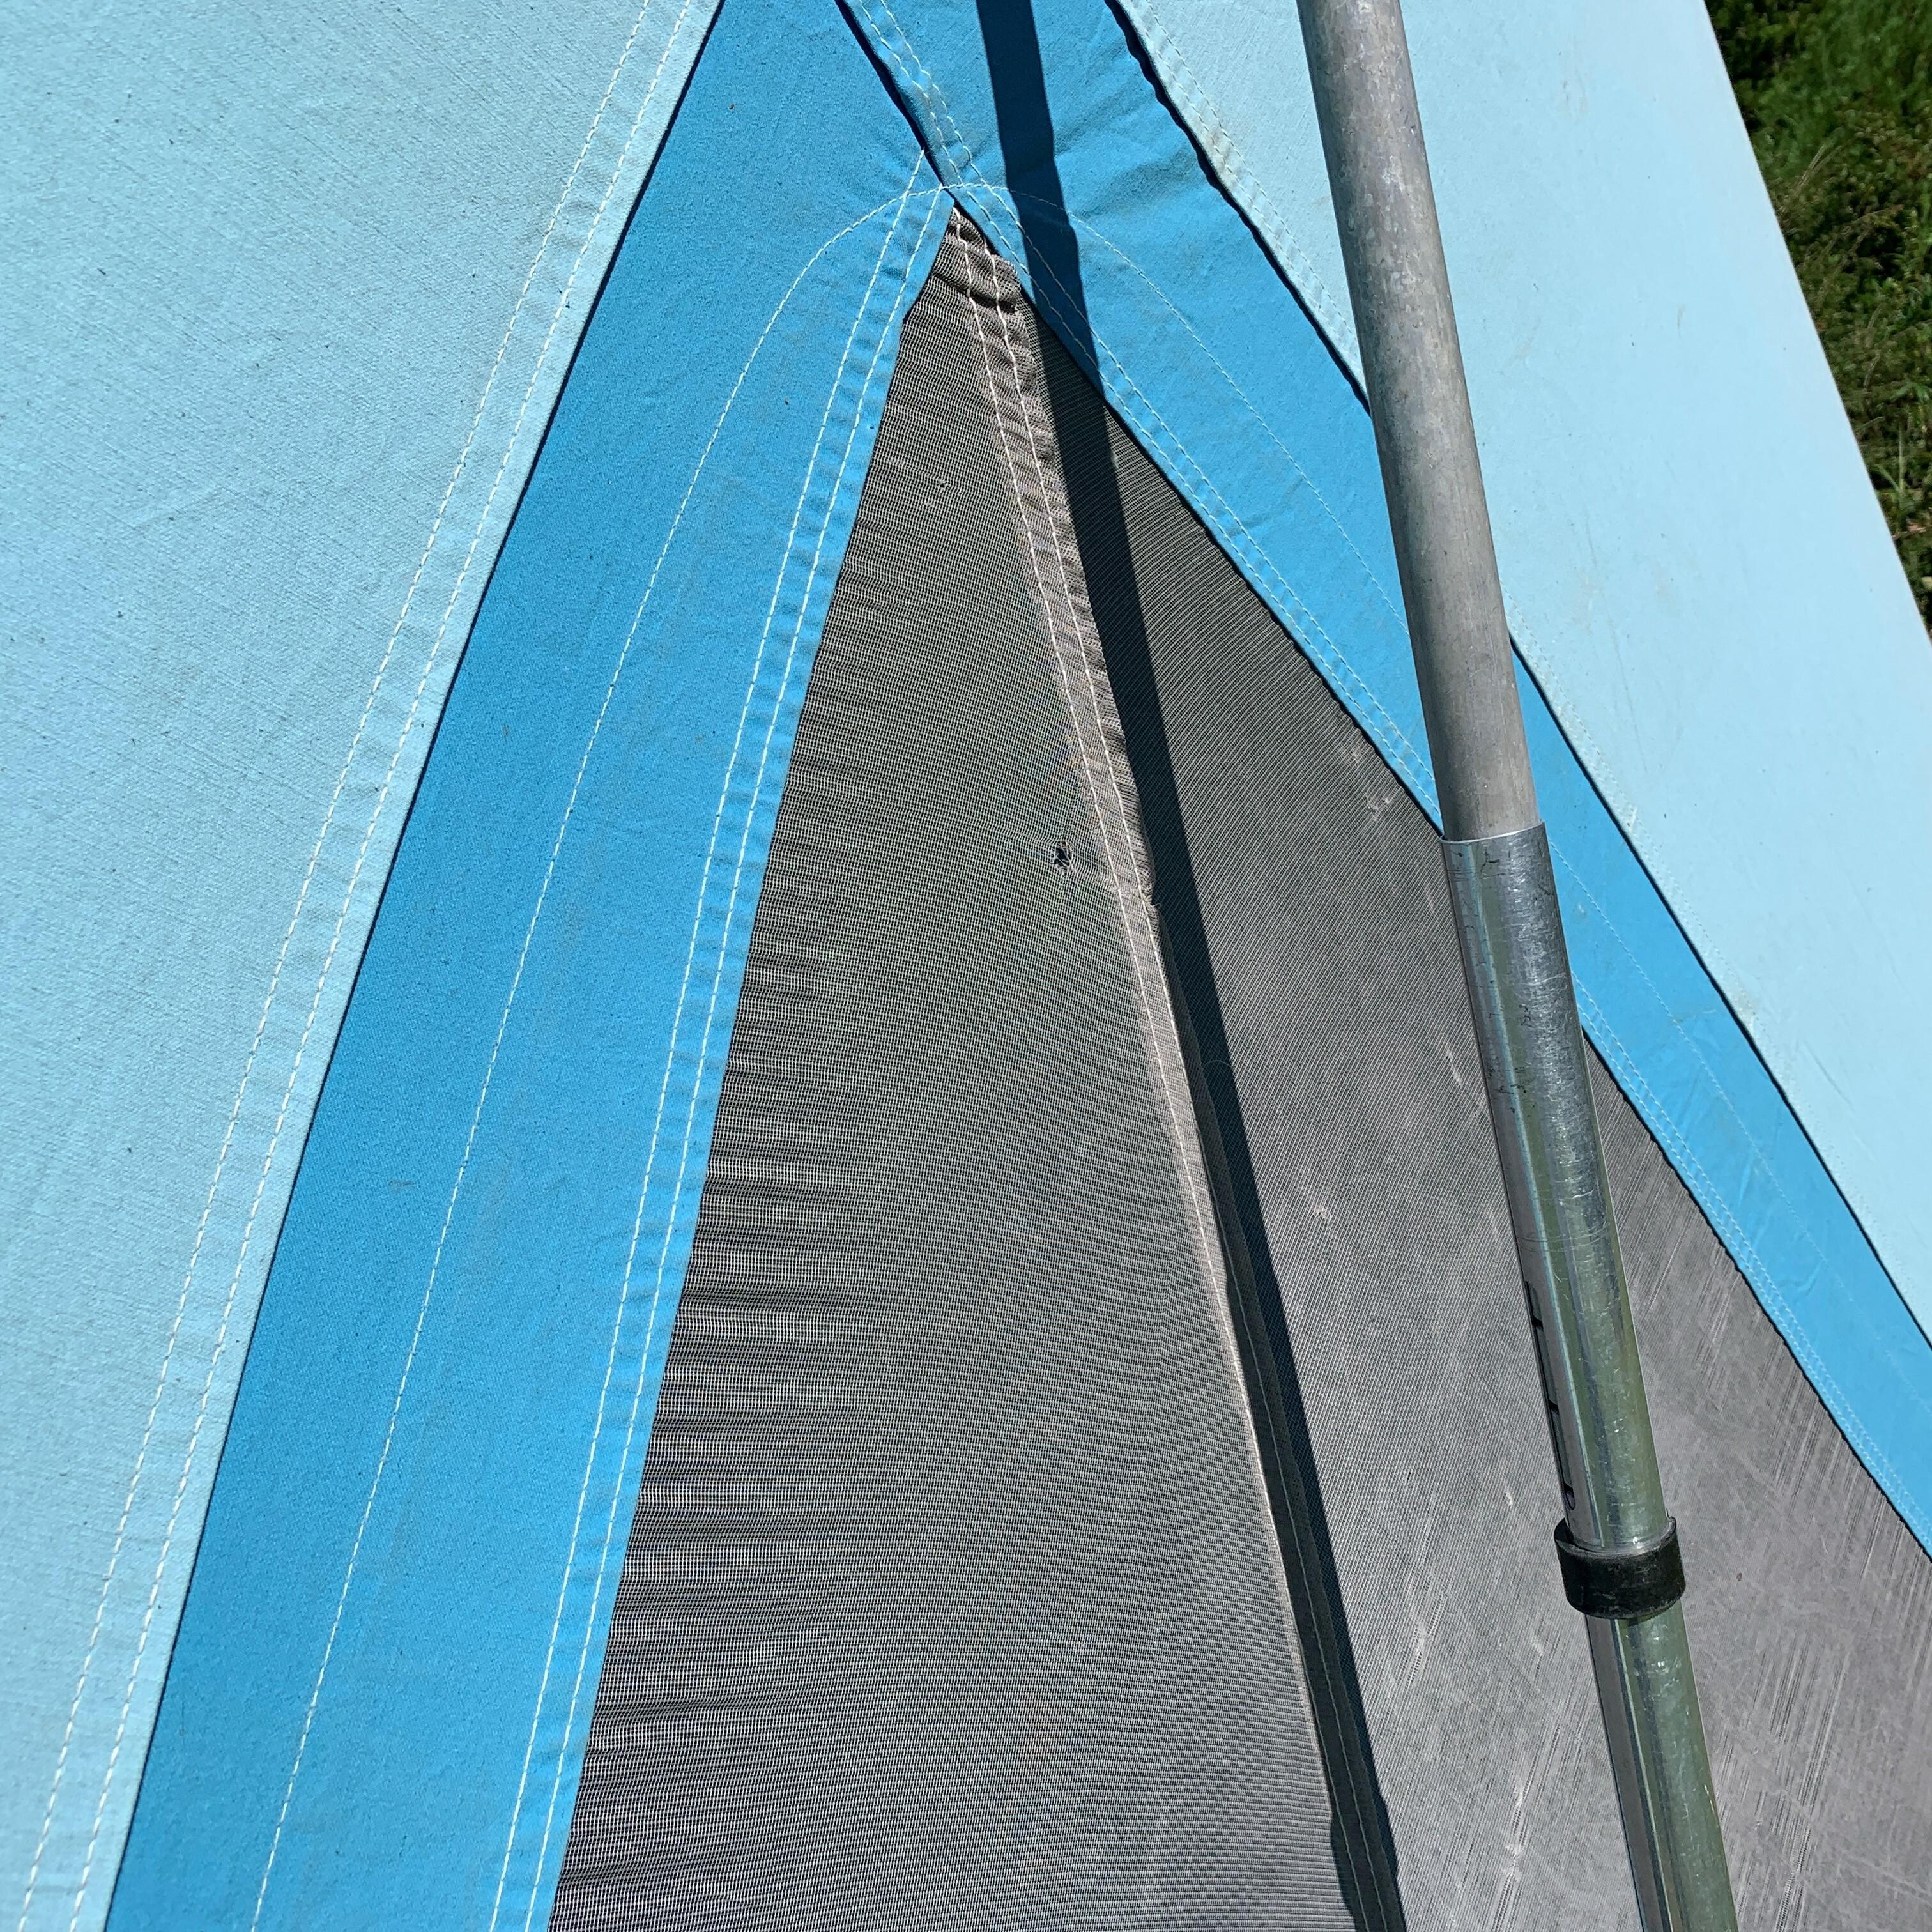 Olympic Cotton Tent 11x10 Quot 8481a840 Quot Coleman コールマン オリンピック